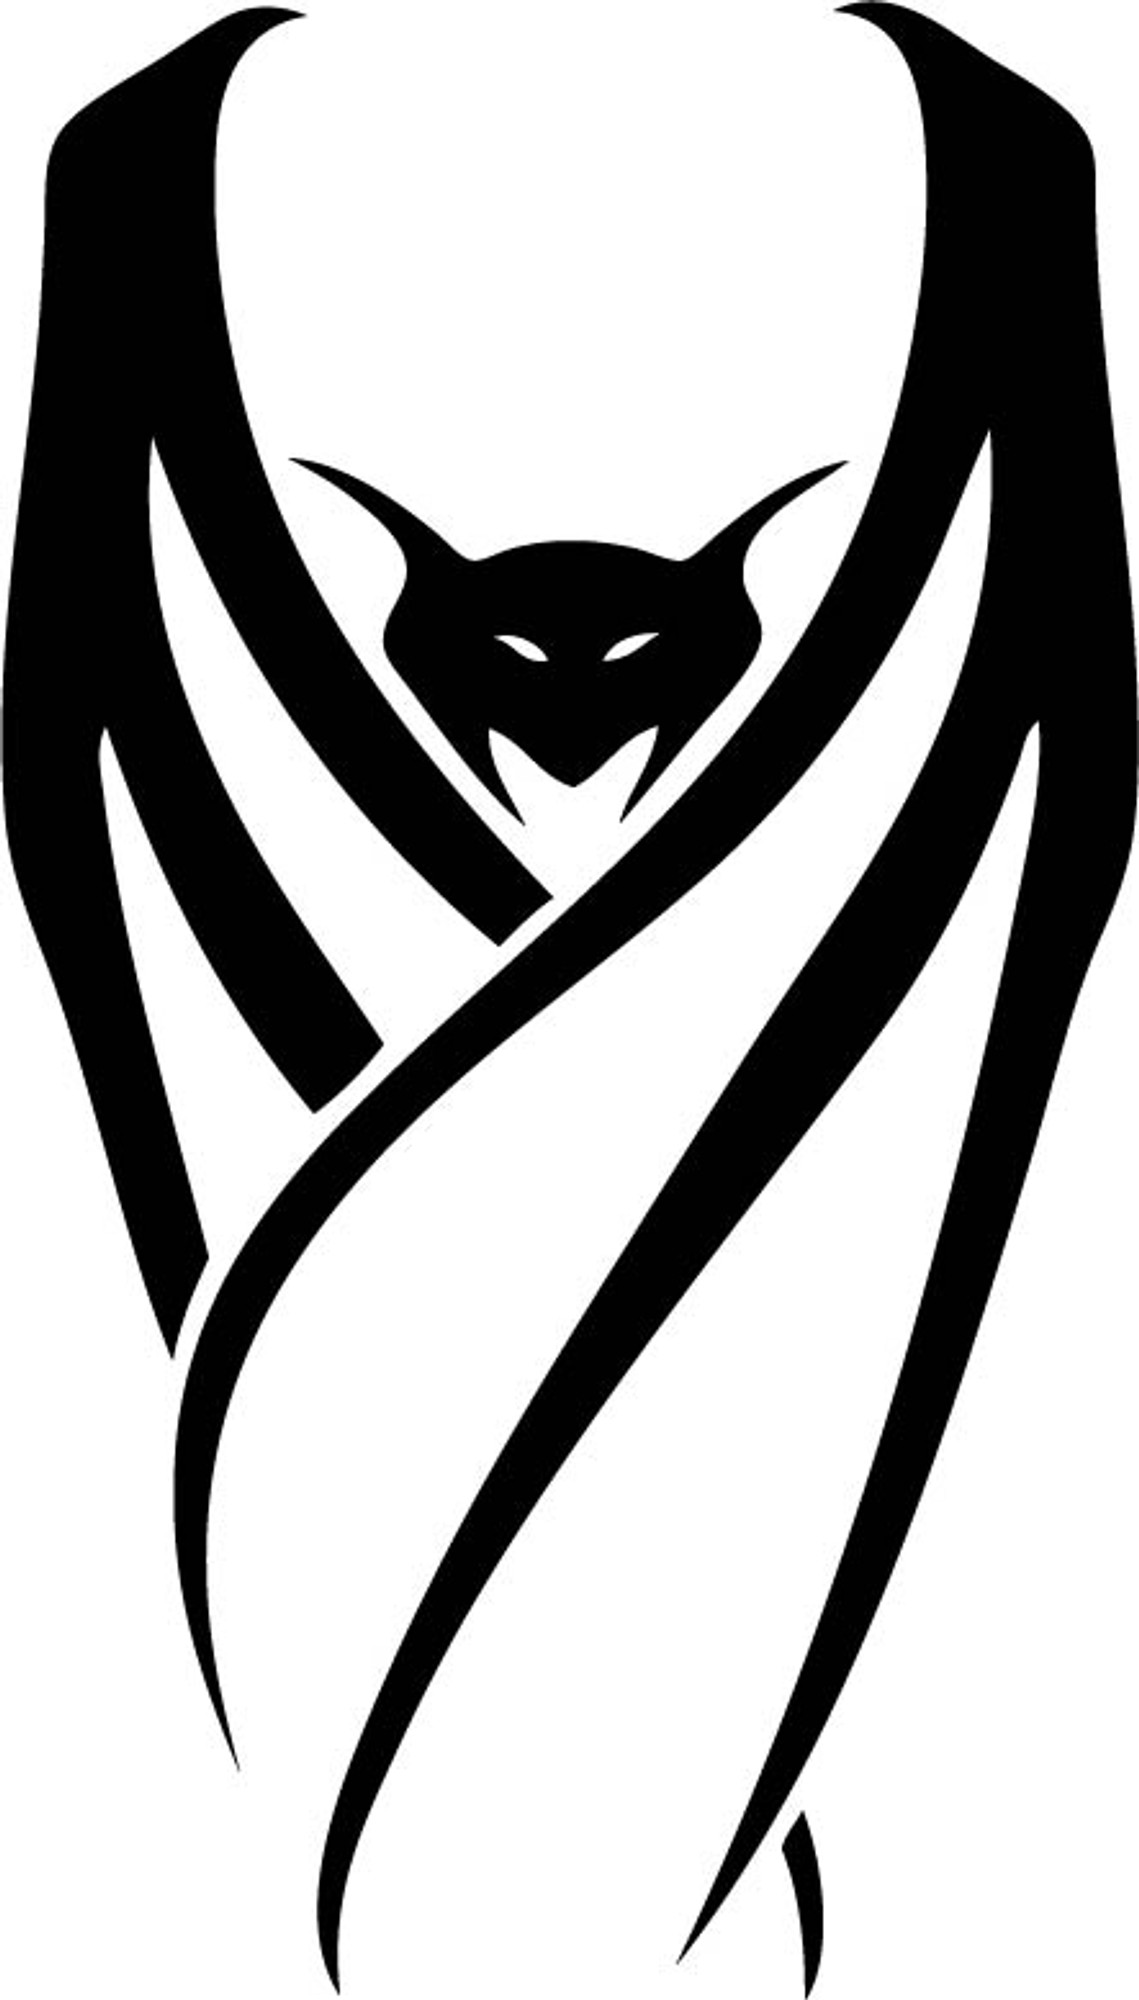 Animal Car Decals Car Stickers Bat Car Decal 02